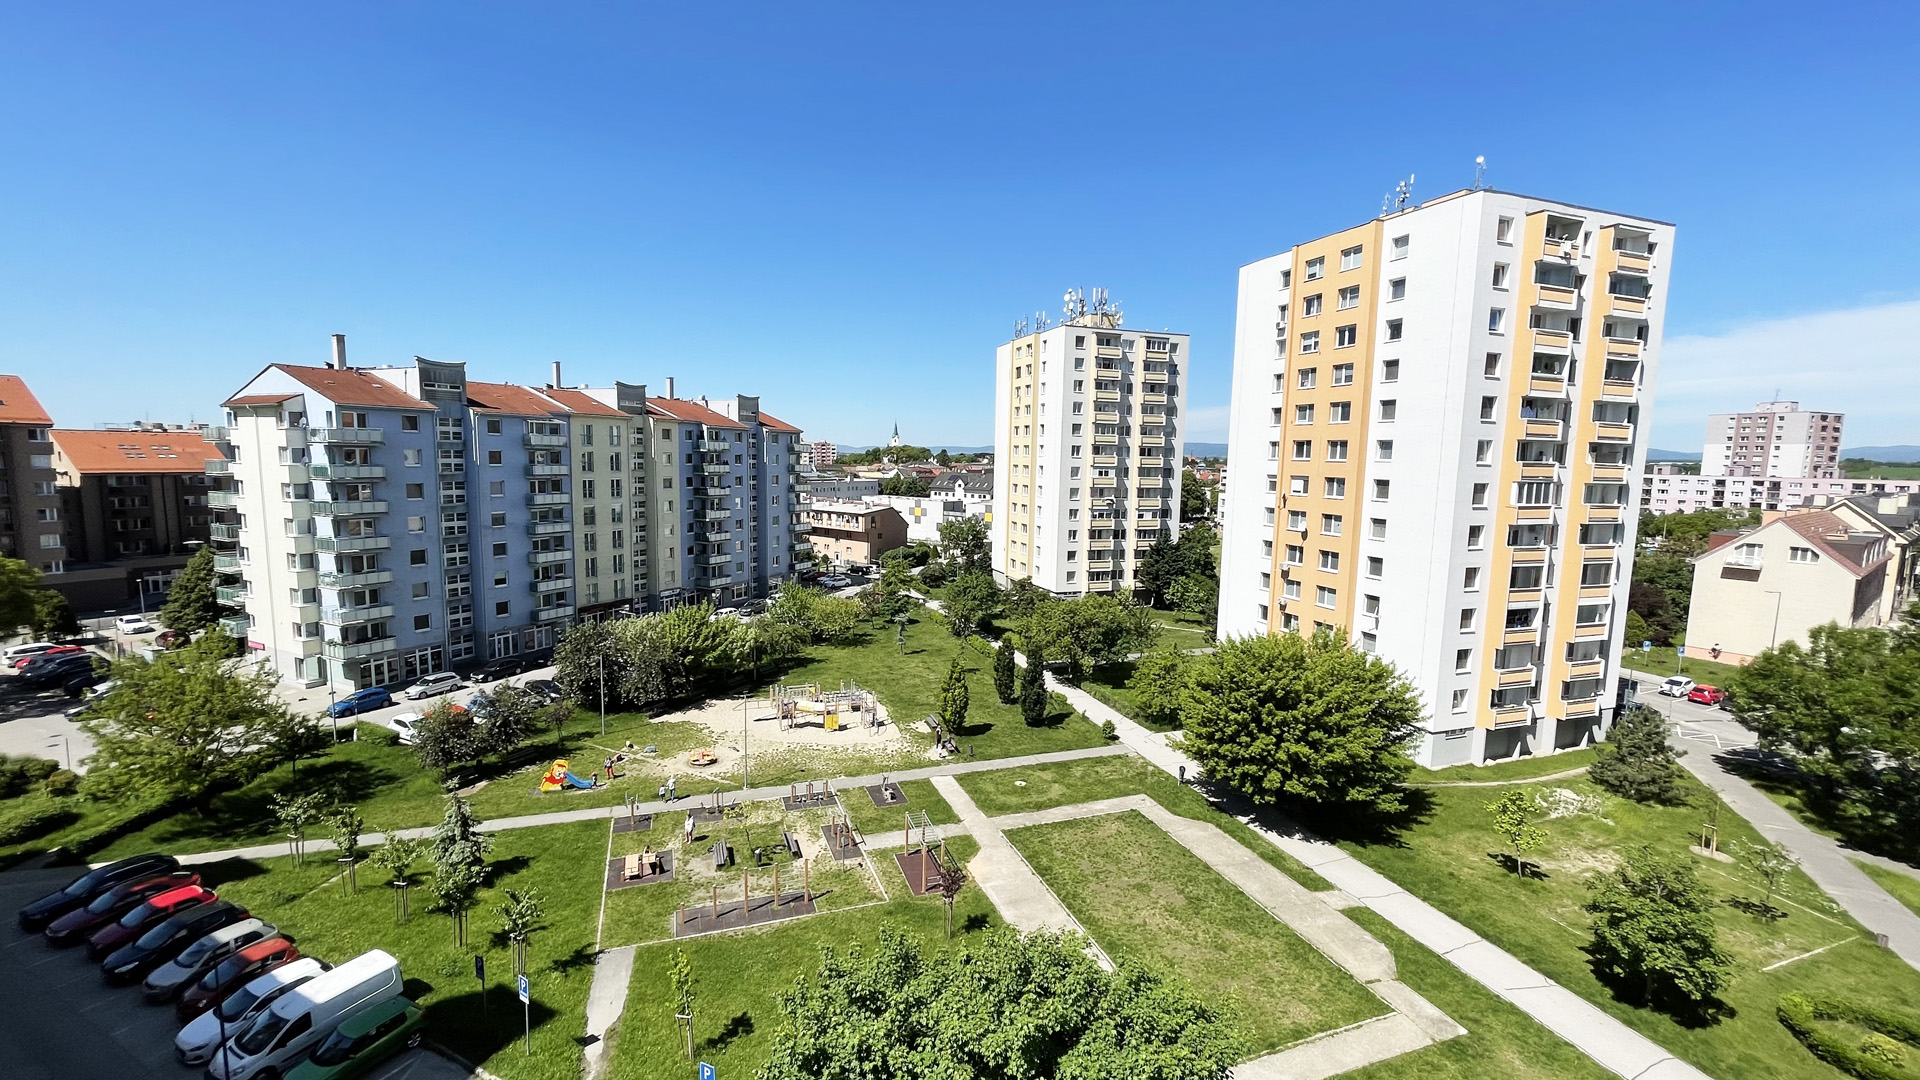 2 izbový byt v centre mesta Senec